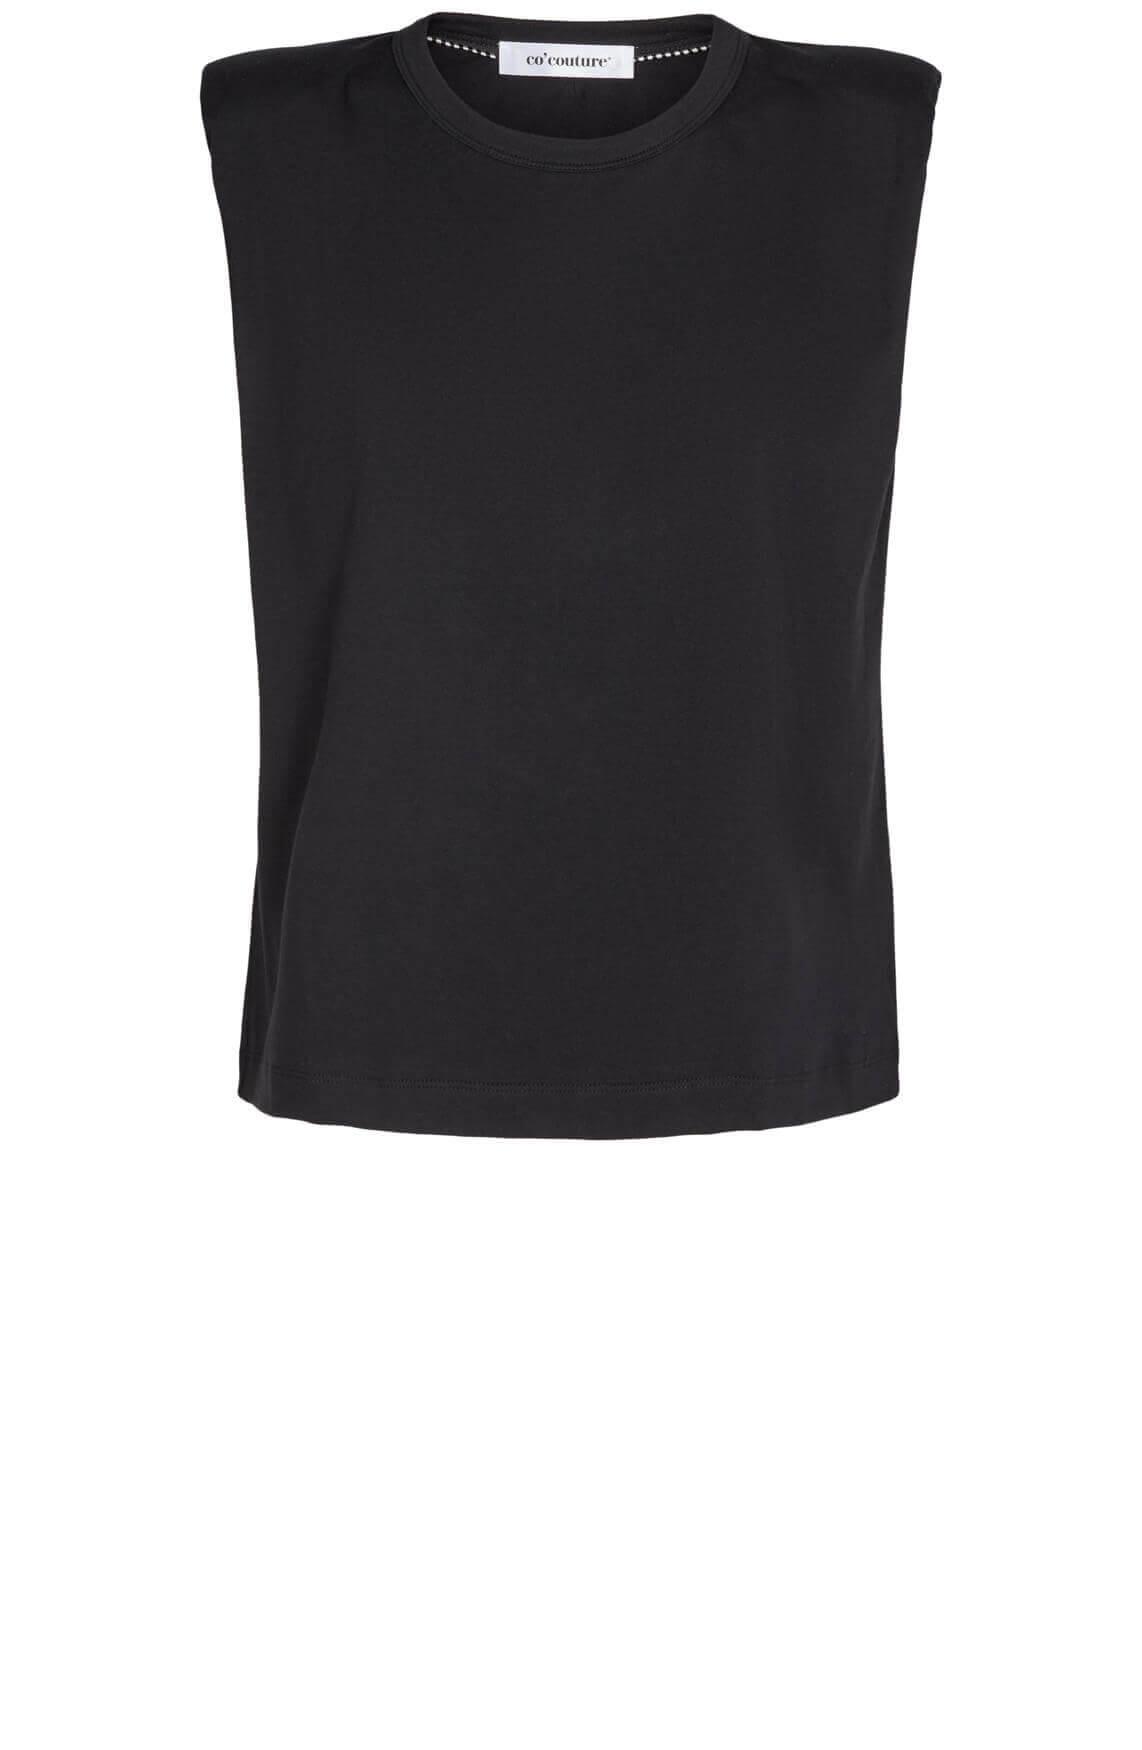 Co Couture Dames Eduarda shirt zwart